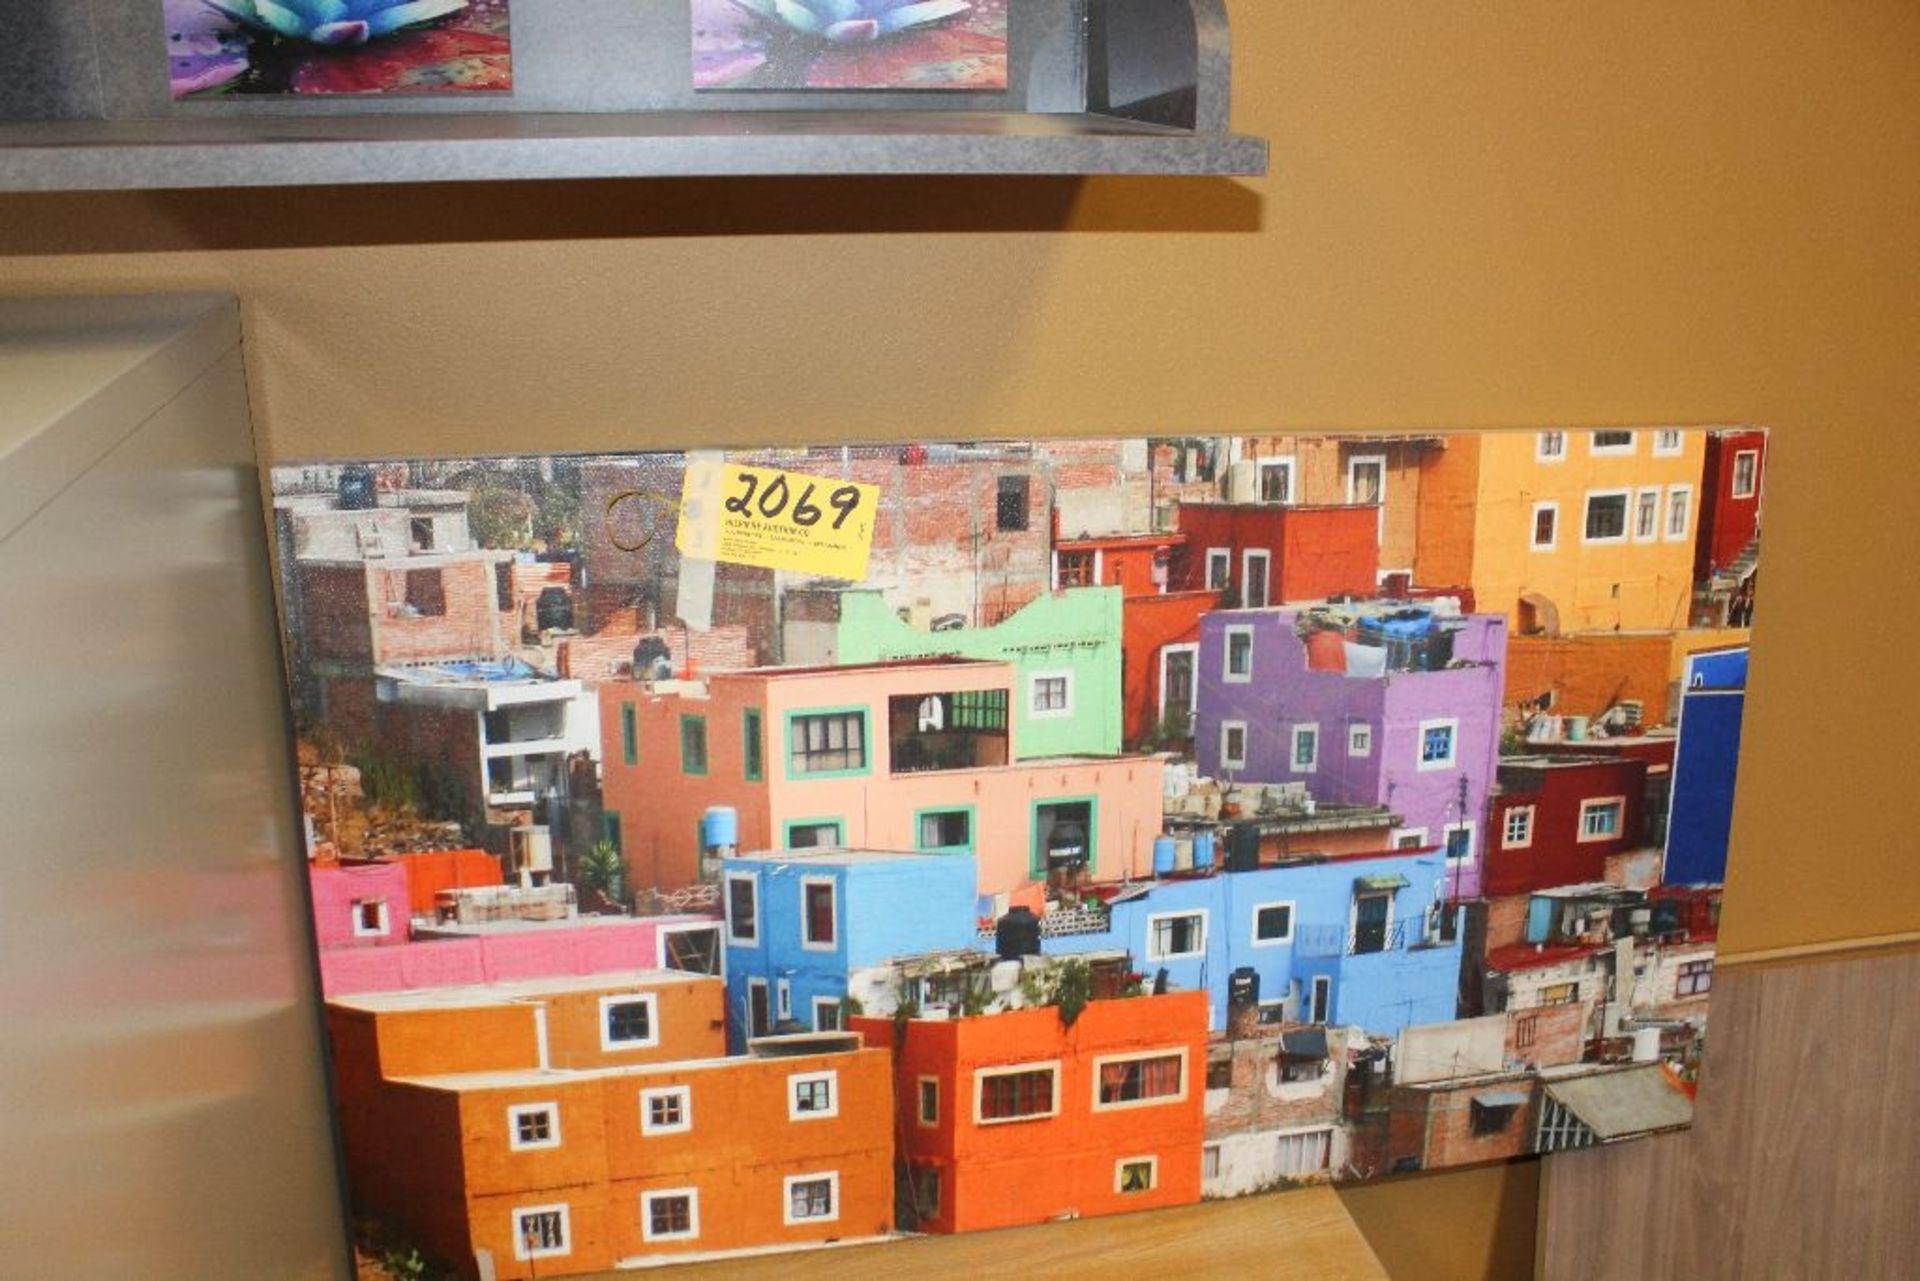 Lot 2069 - City Apartment scene.